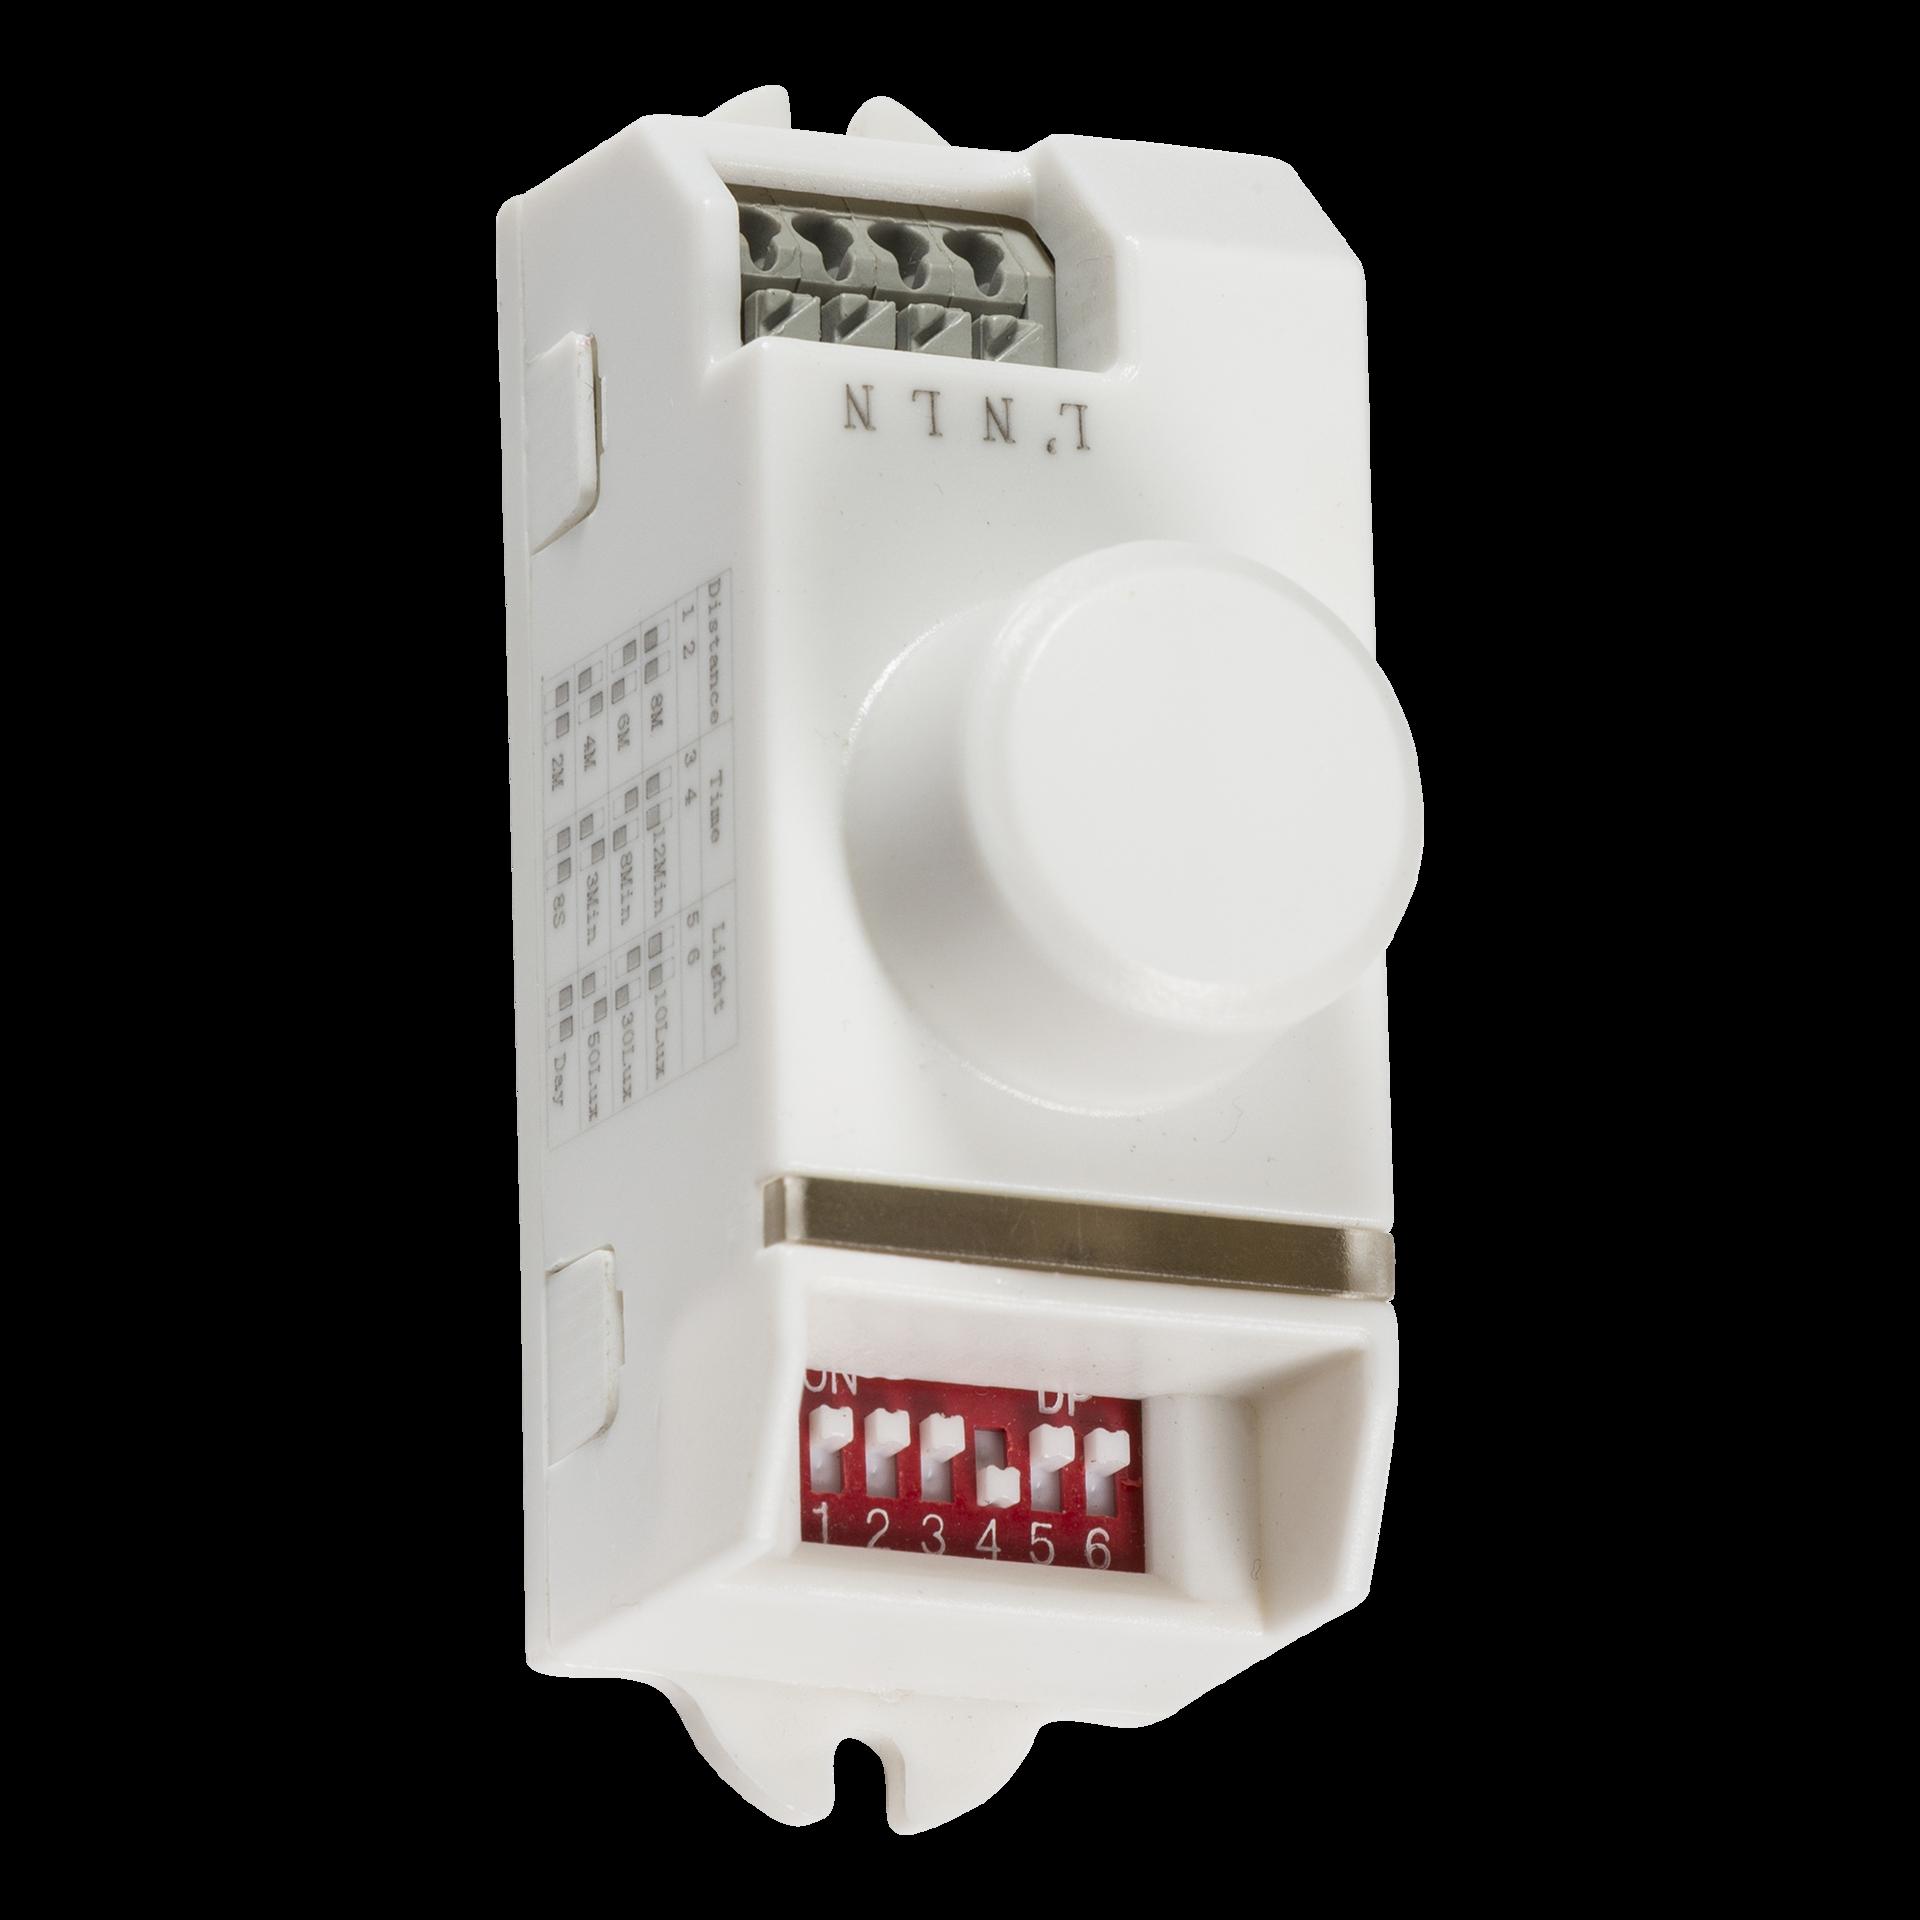 5.8Ghz microwave sensor